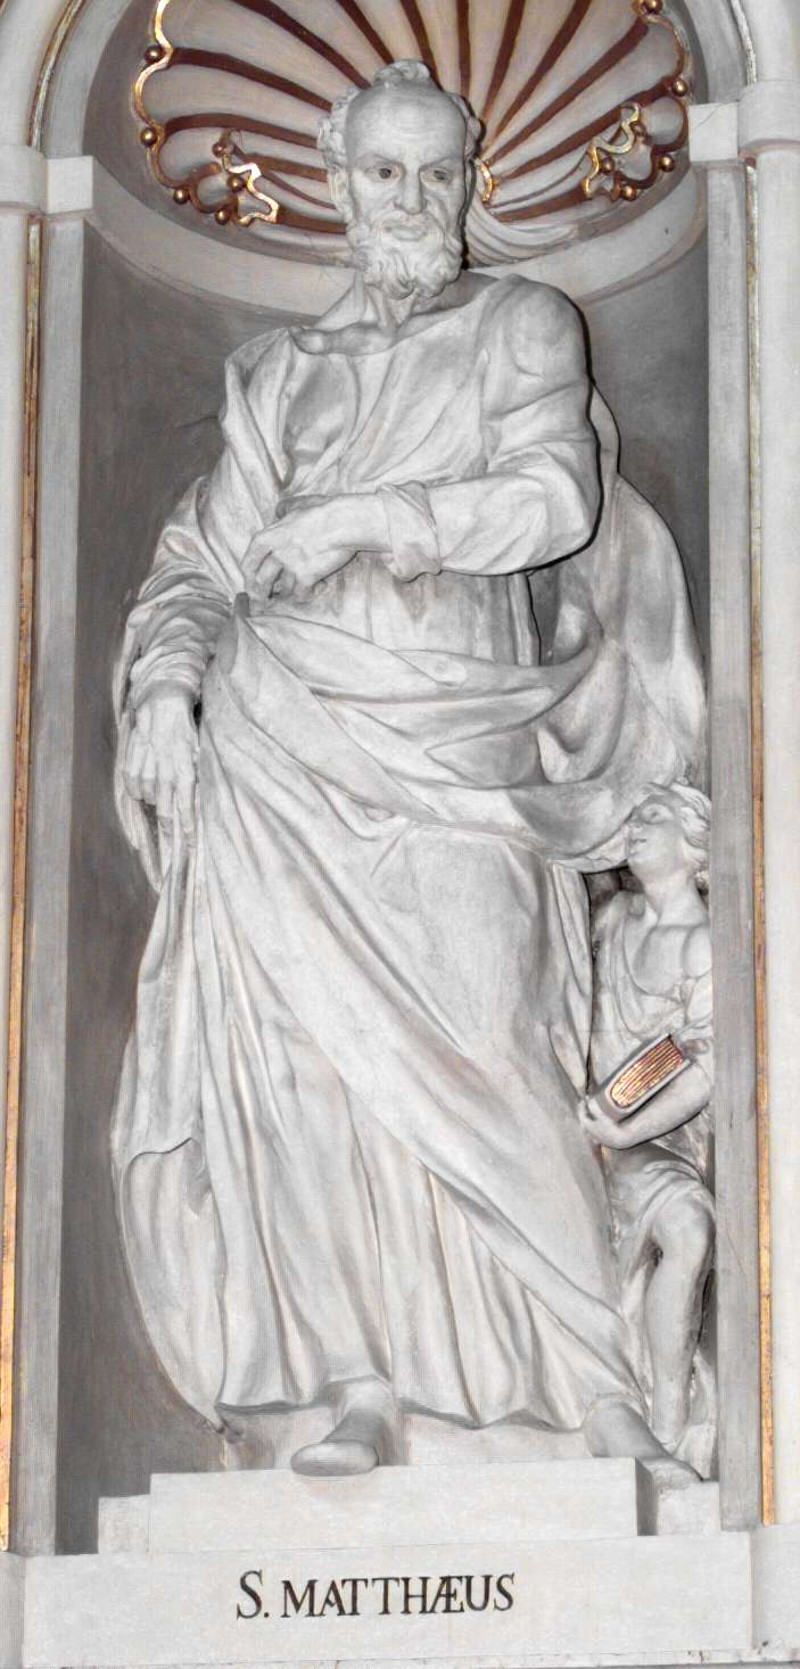 Calegari S. (1688), San Matteo